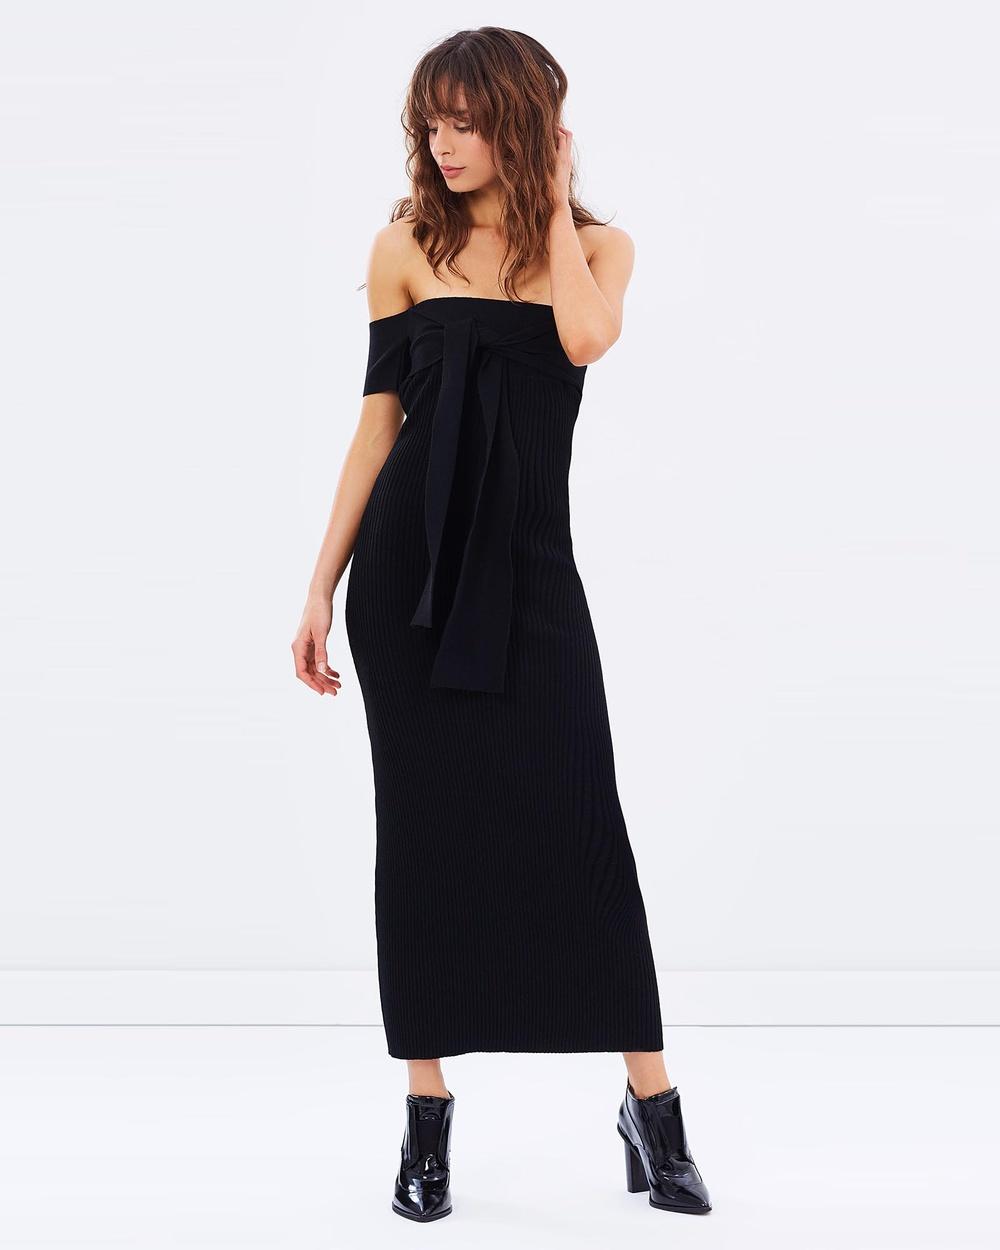 Friend of Audrey Black Escada Off Shoulder Knit Dress